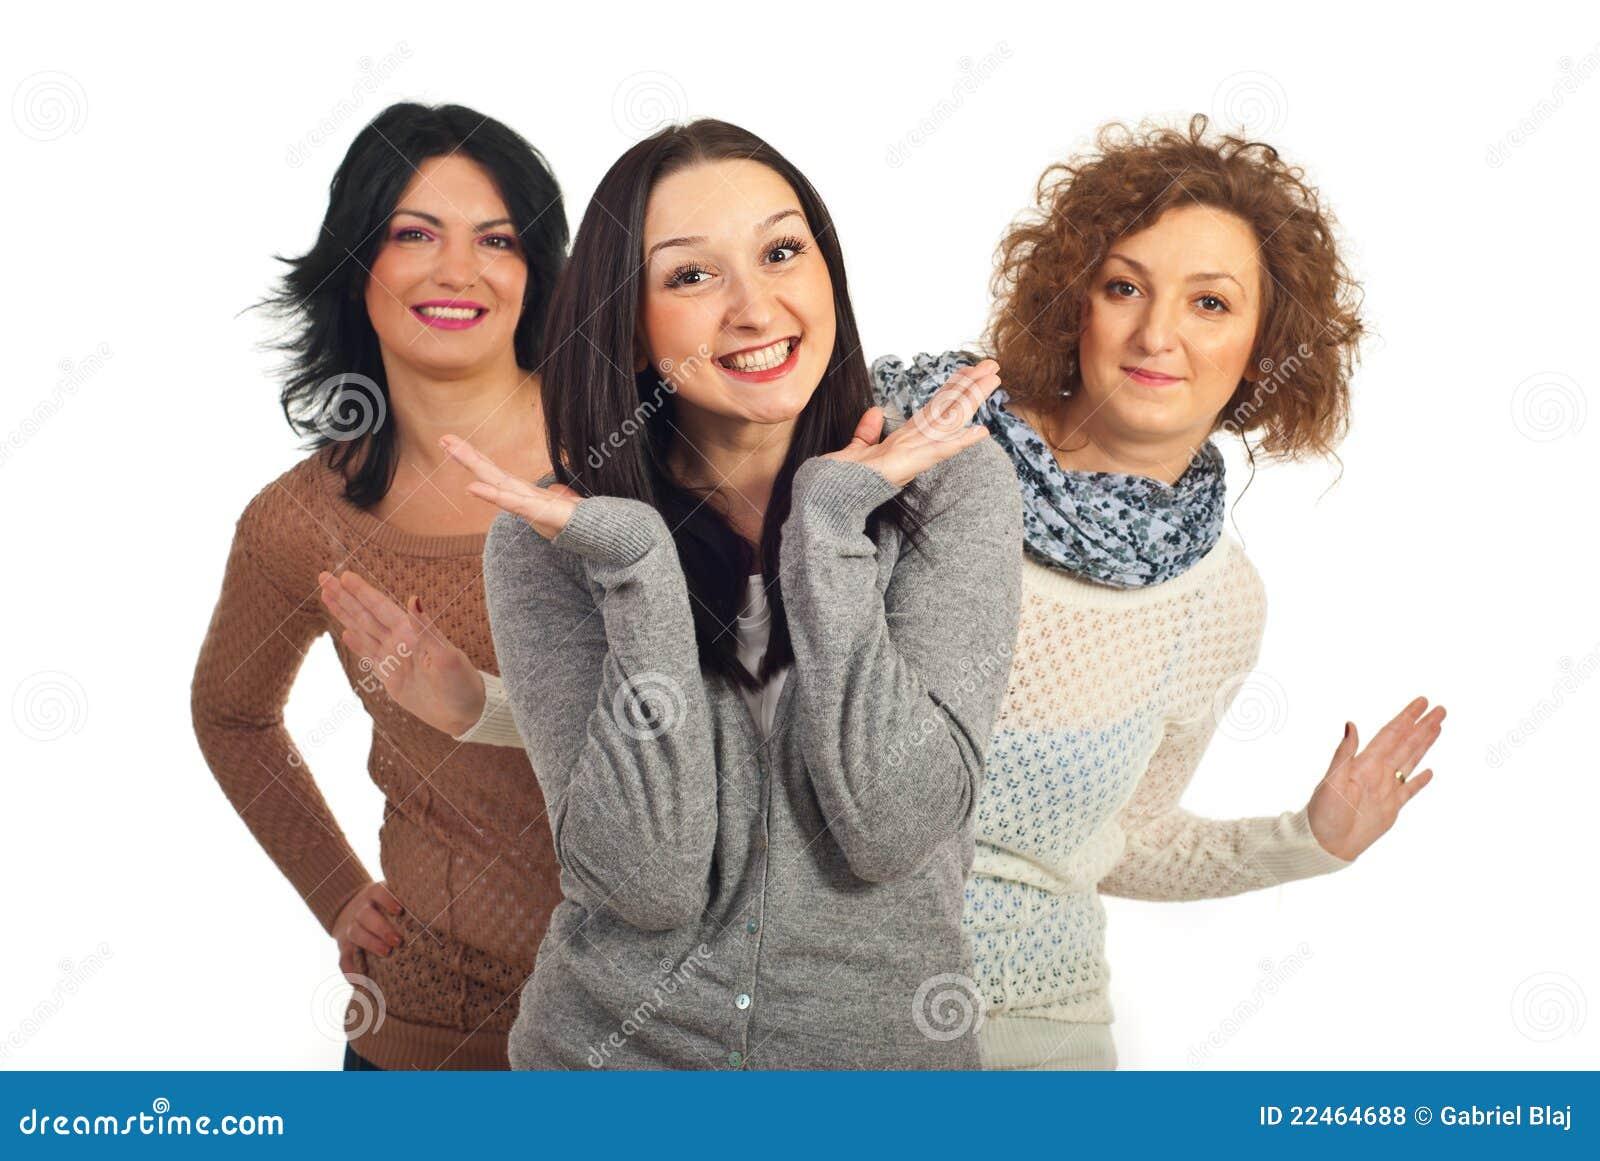 happiness women friends